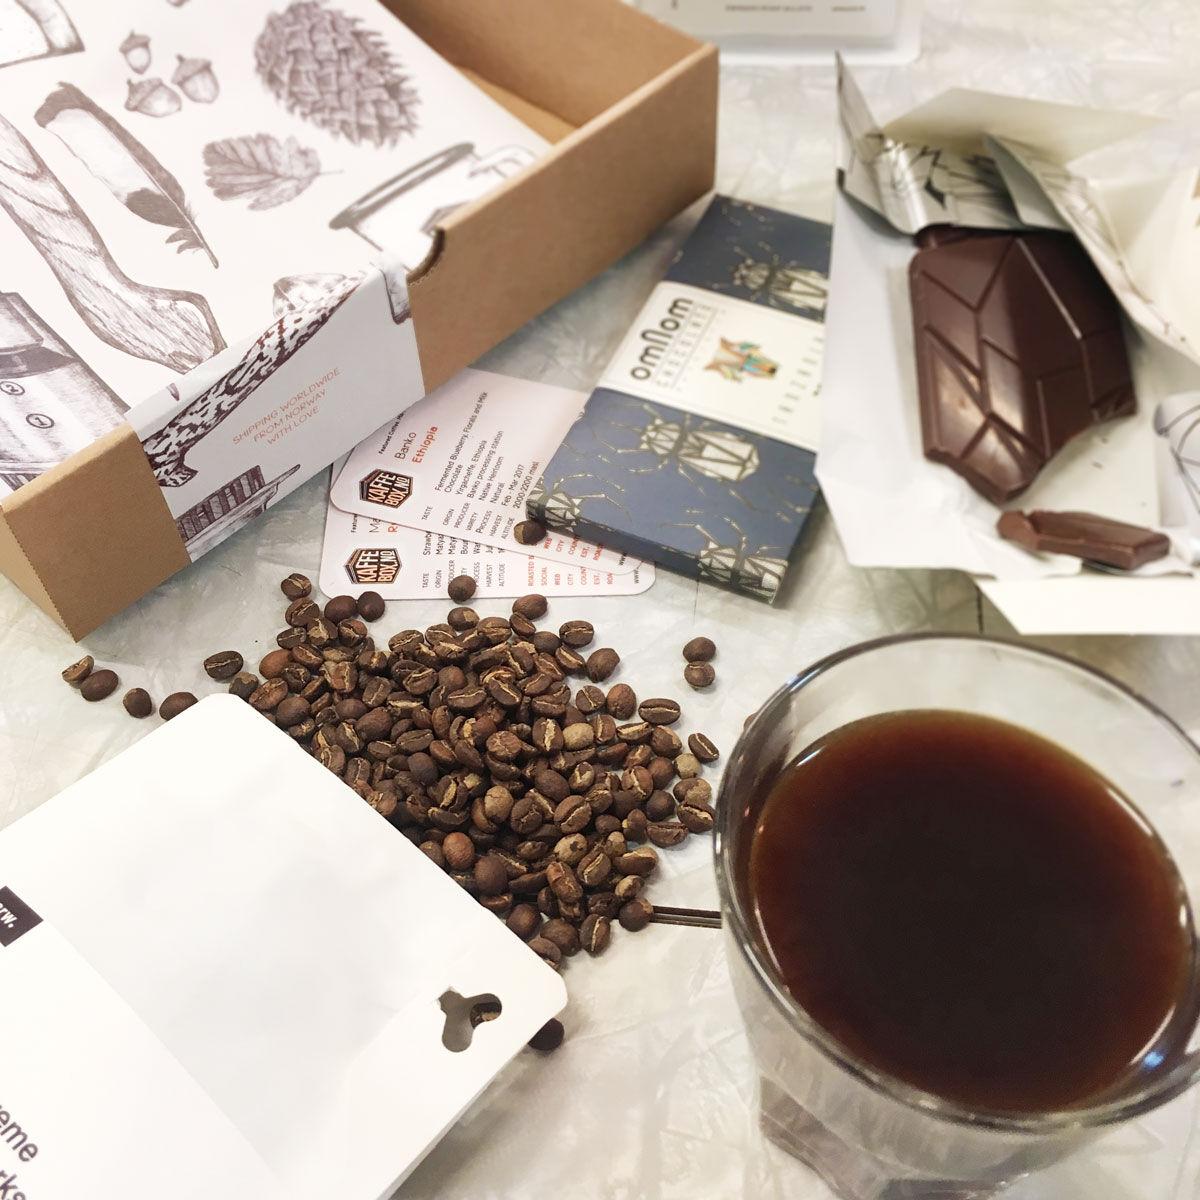 KaffeBox Chocolate Pairing Subscription - 500g, 4 bars